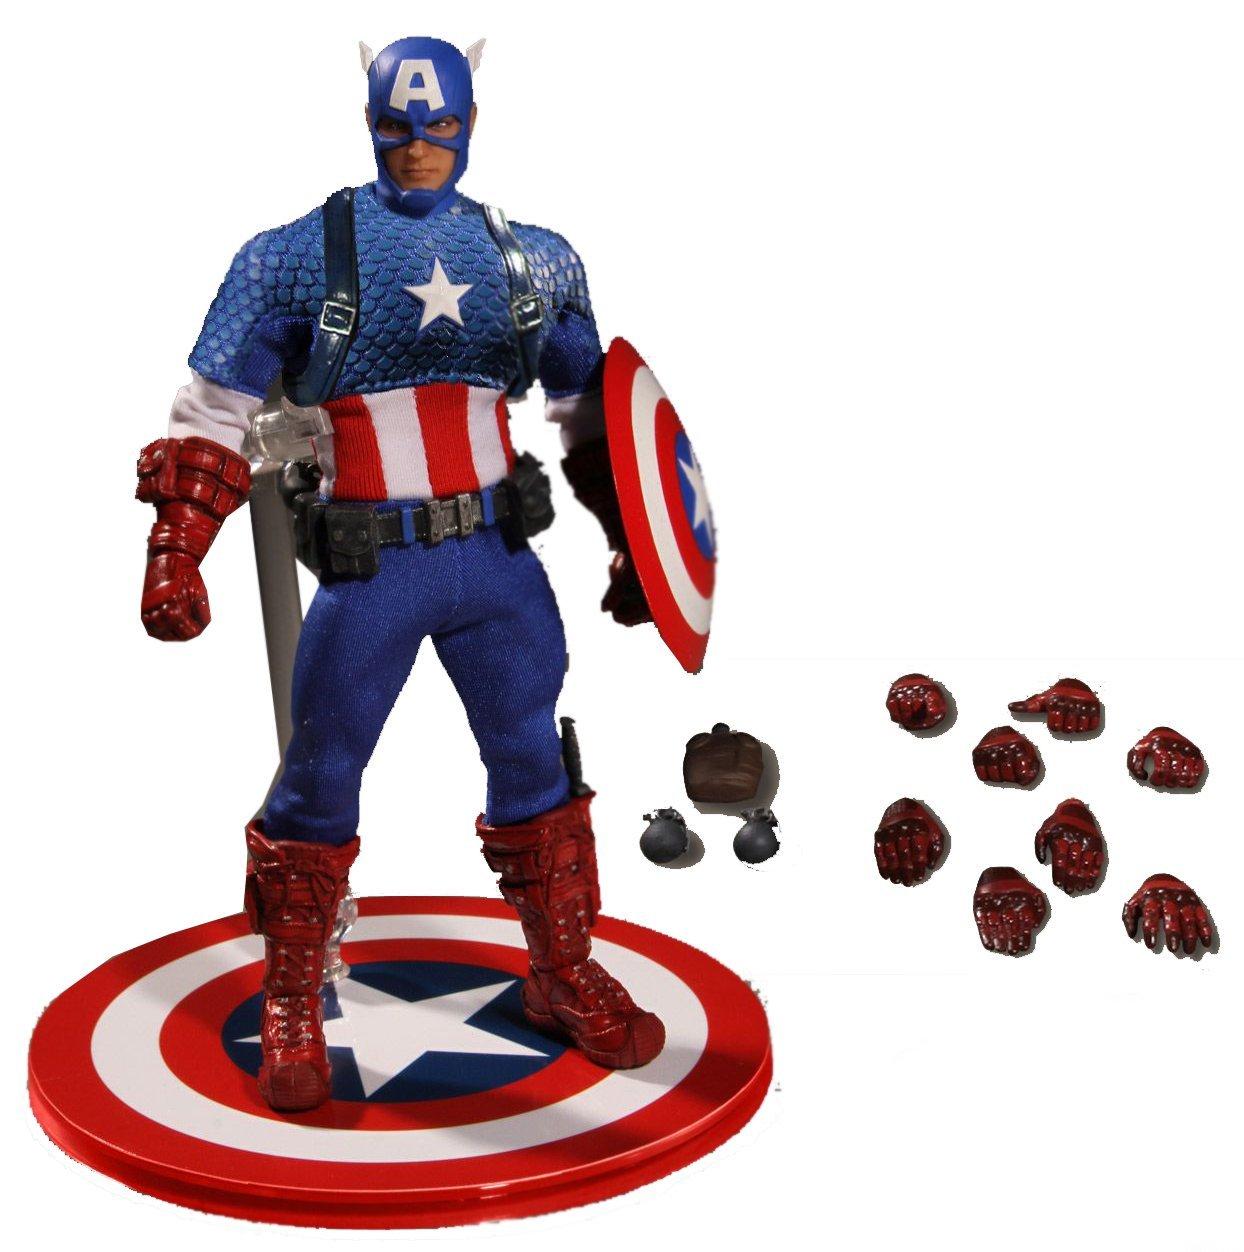 Mezco Toyz ONE:12 COLLECTIVE Marvel Comics Captain America Deluxe Classic Version 2016 SDCC Con Exclusive 1/12 Scale B01JKAO3BC